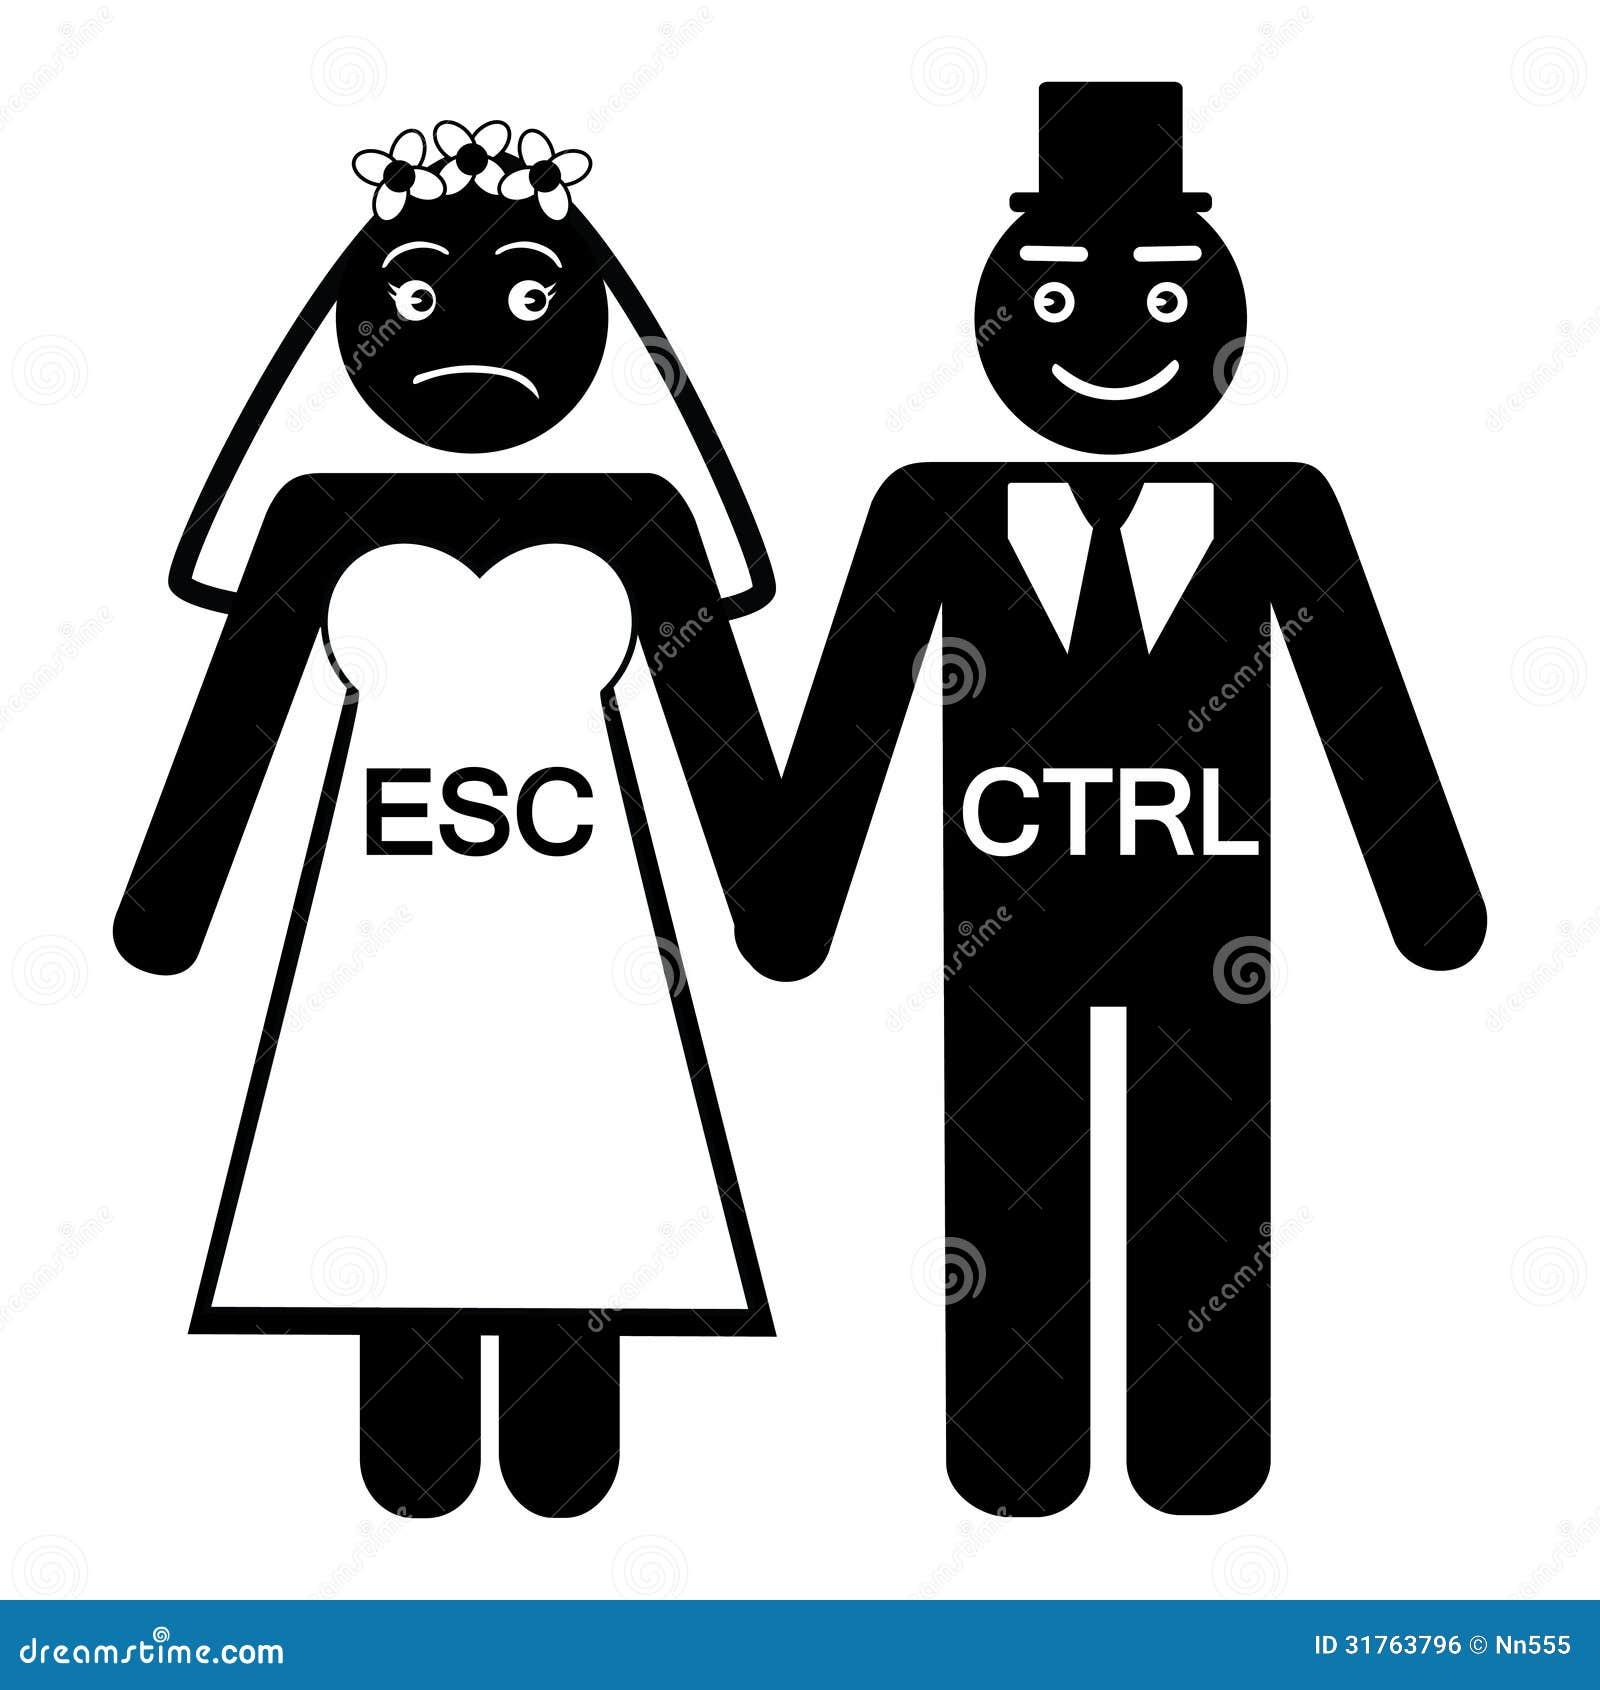 Bride ESC Groom CTRL Icon Royalty Free Stock Image - Image: 31763796